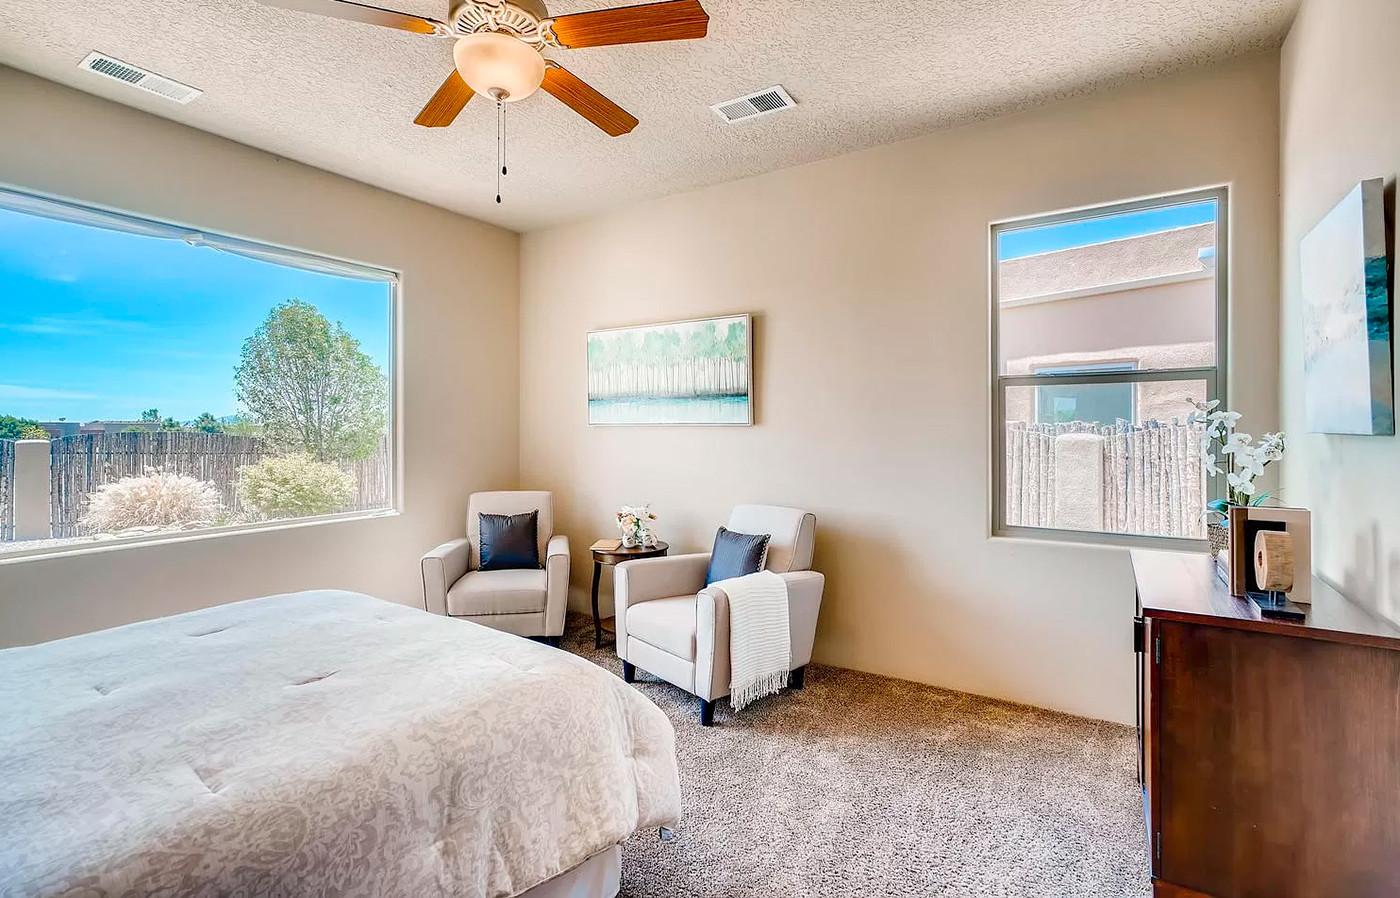 Canto Del Pajaro | Sunny Bedroom in Newer Santa Fe Home